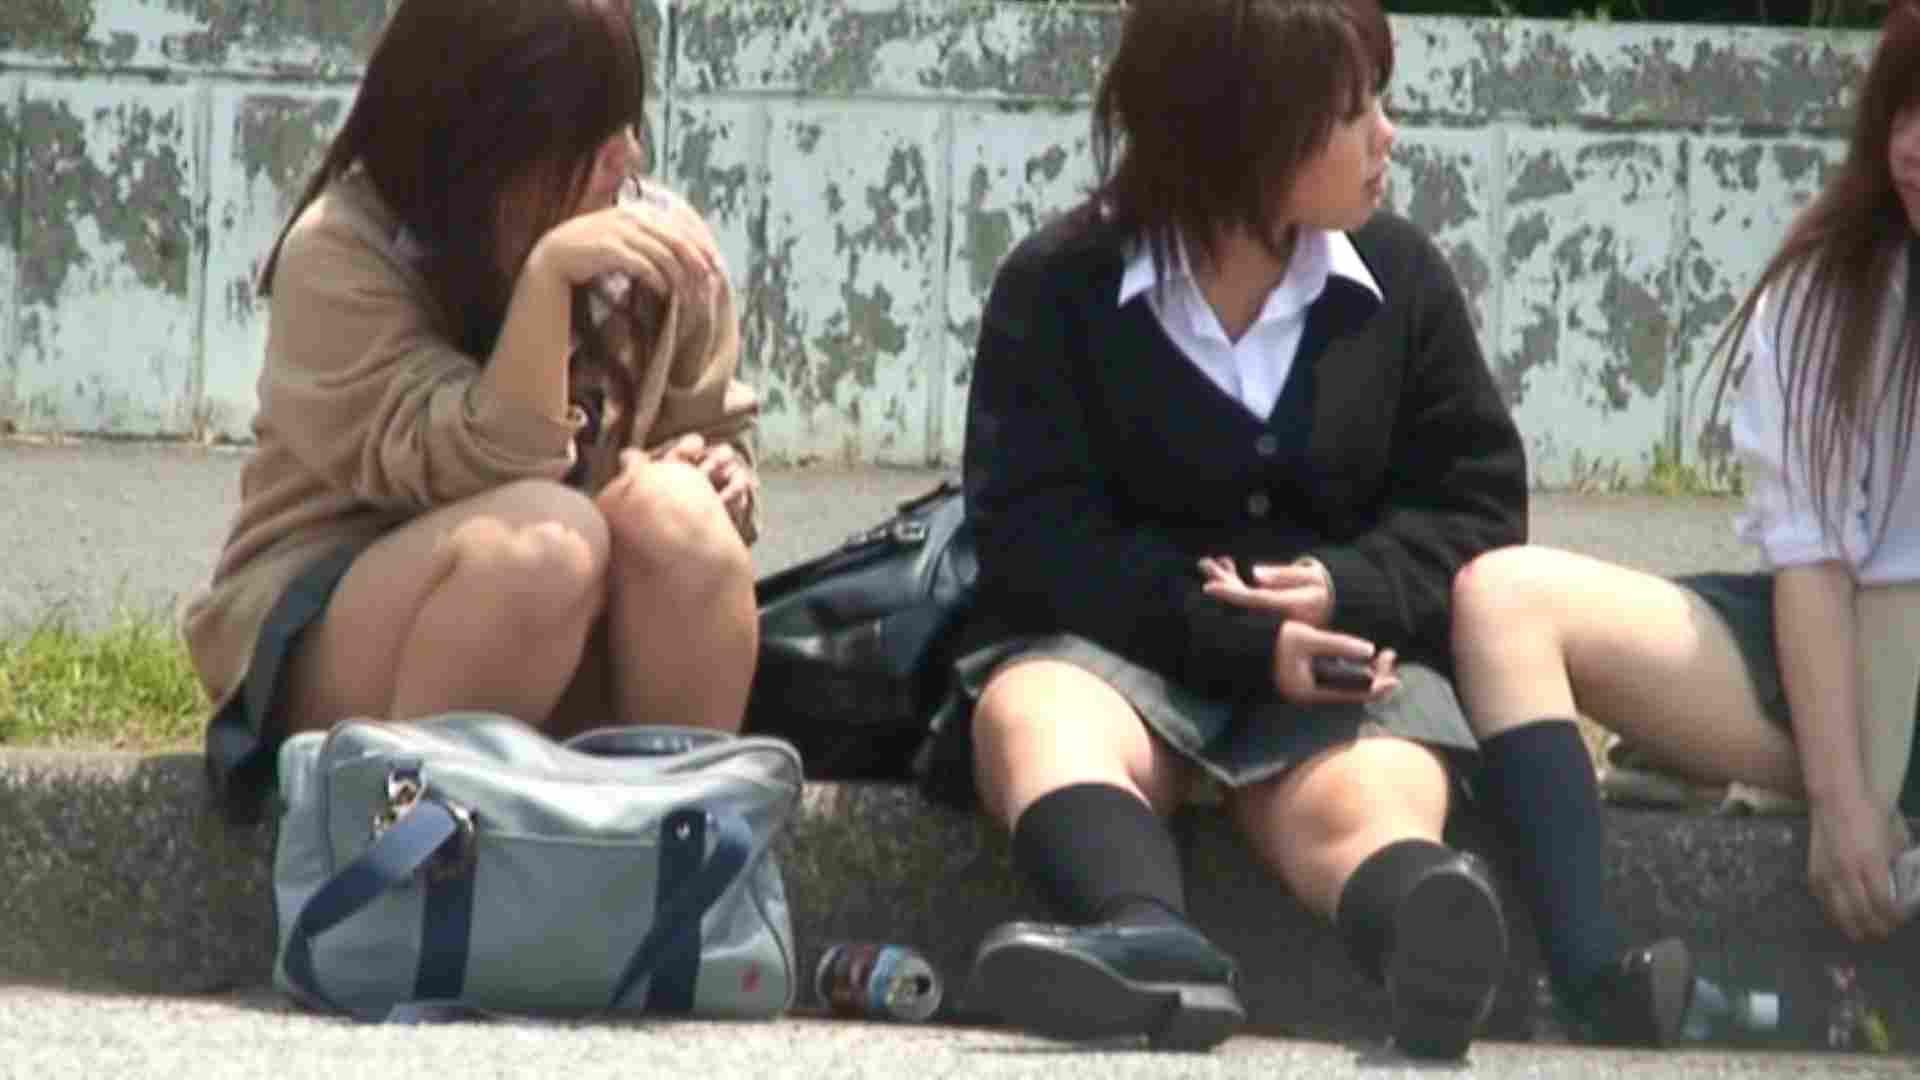 望遠パンチラNo3 学校潜入 盗撮動画紹介 83PIX 83